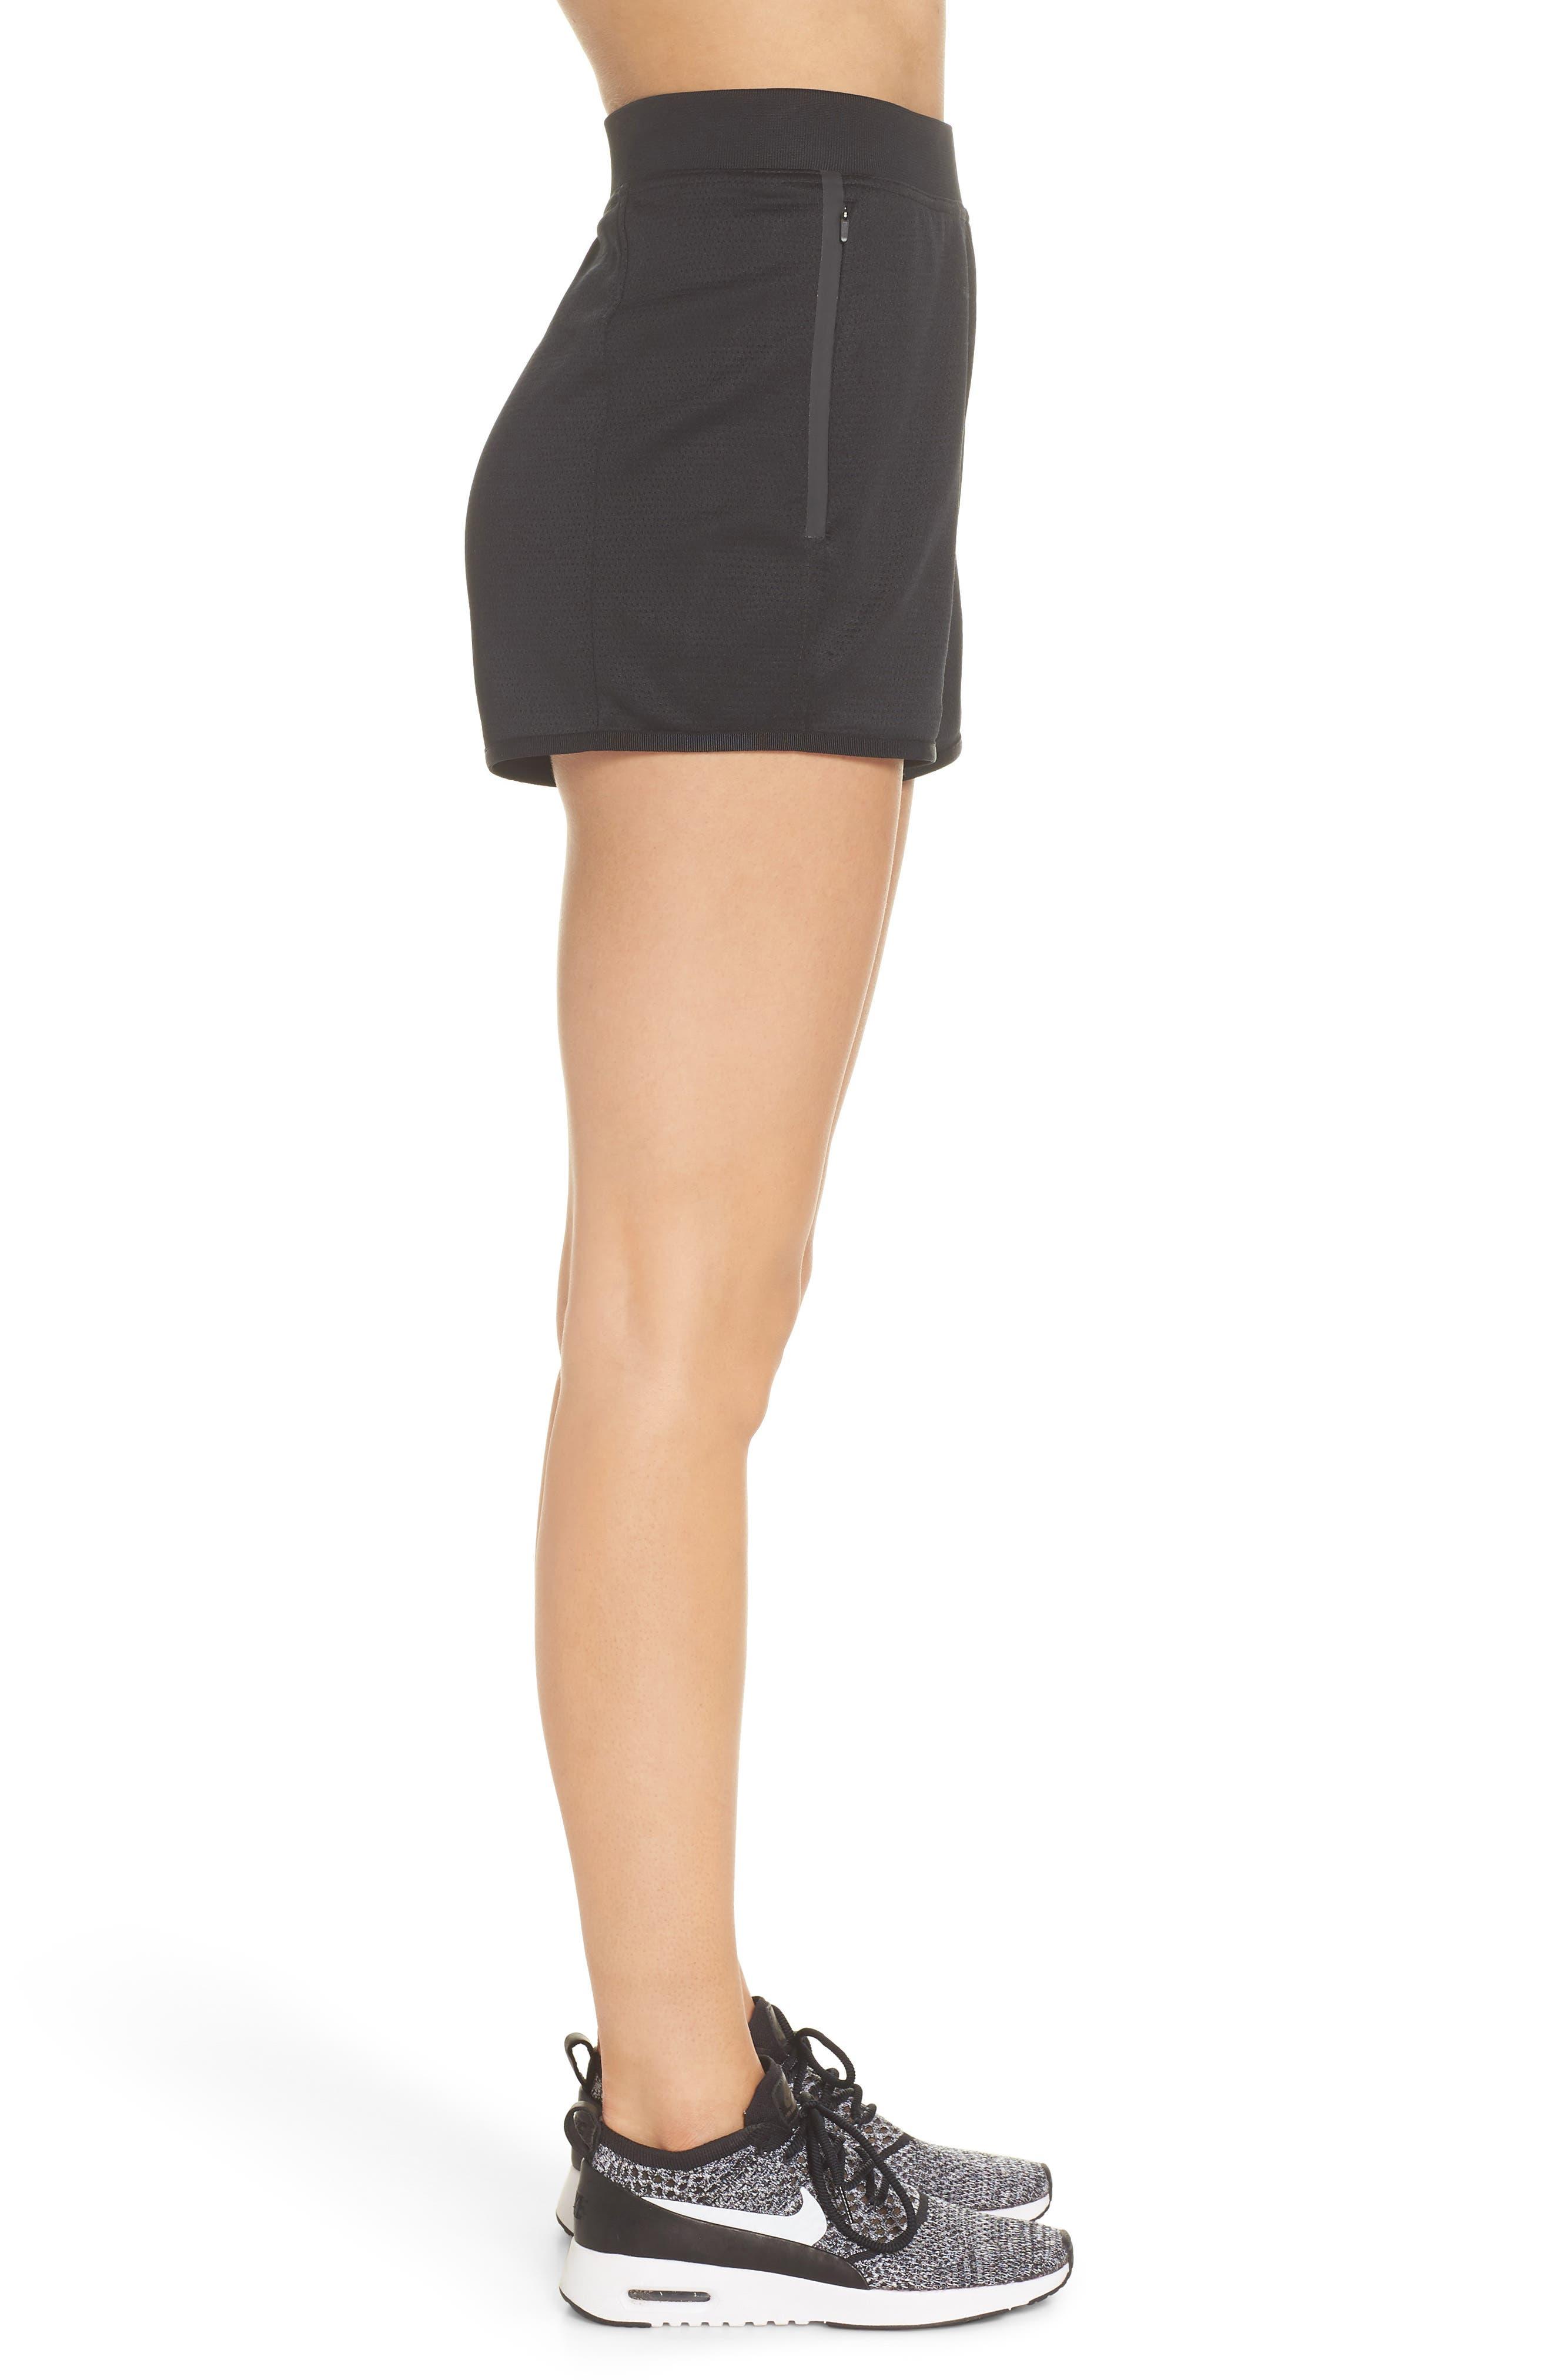 Sportswear Tech Fleece Short,                             Alternate thumbnail 3, color,                             Black/ Black